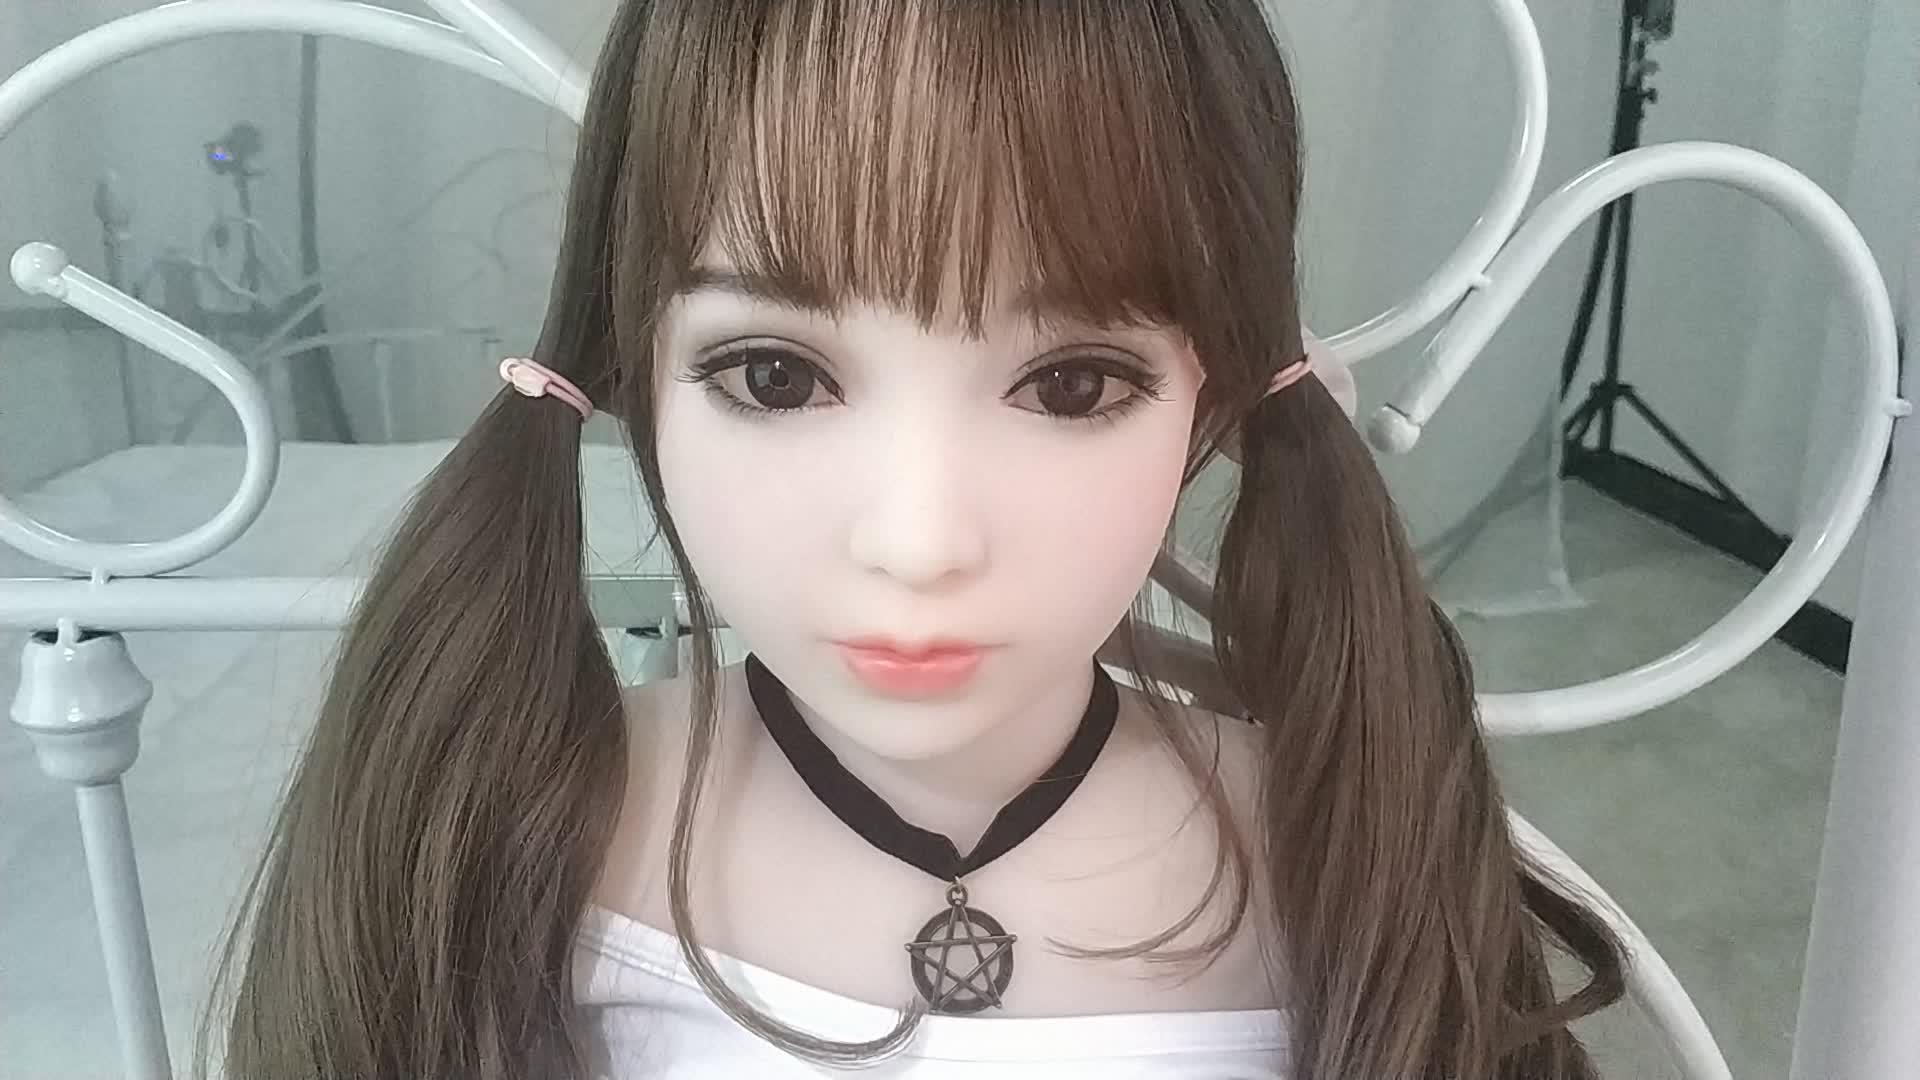 130 Cm Jepang 18 Gadis Muda Silicon Boneka Seks Oral Vagina Kecil Payudara Realistis Silikon Seks Nyata Boneka untuk Pria